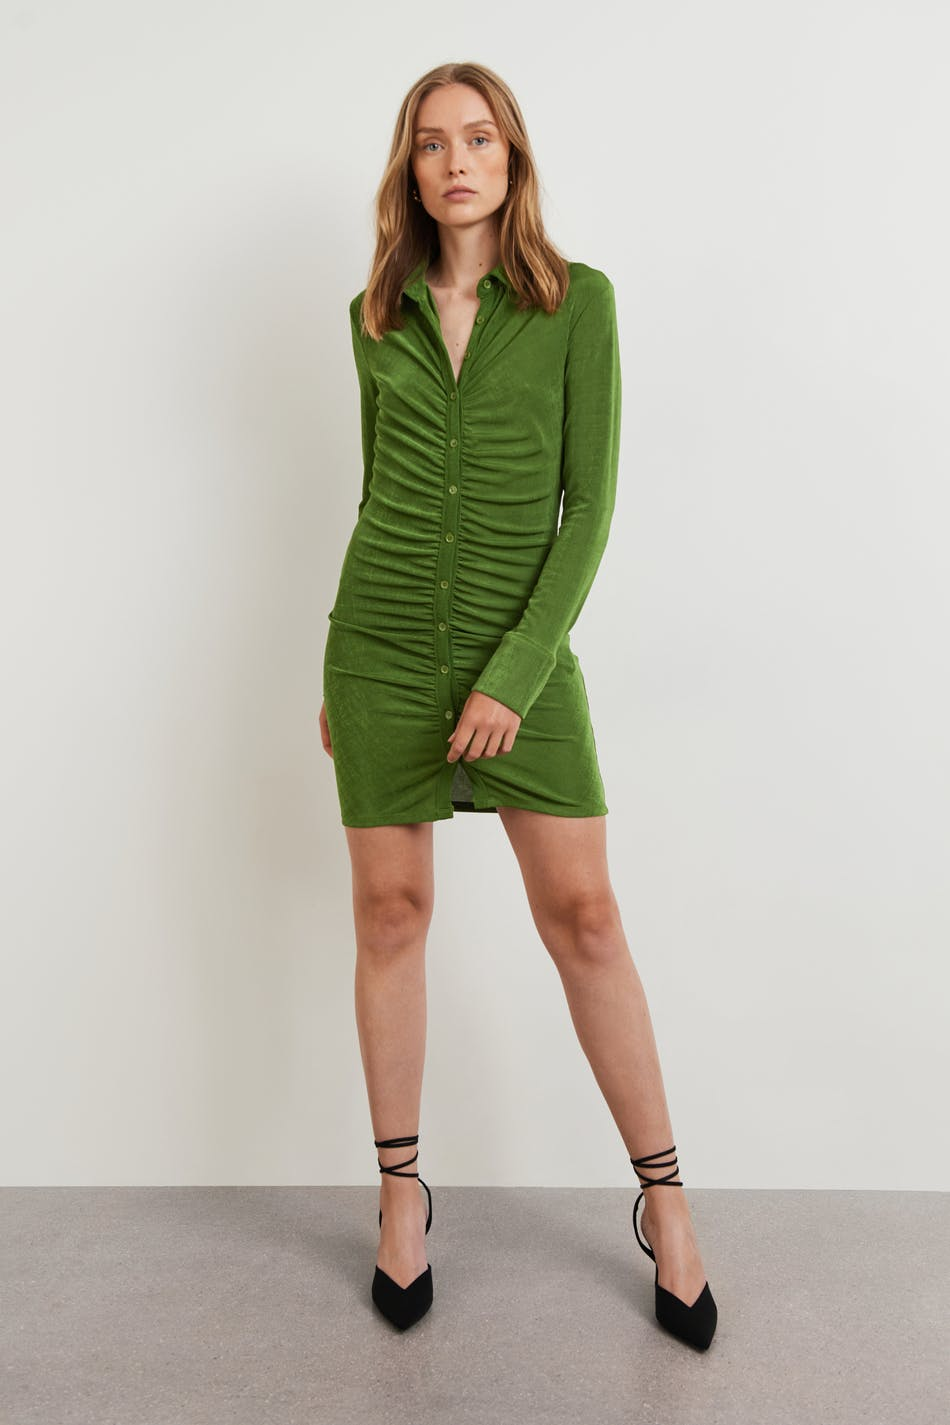 Gina Tricot Dolly shirt dress